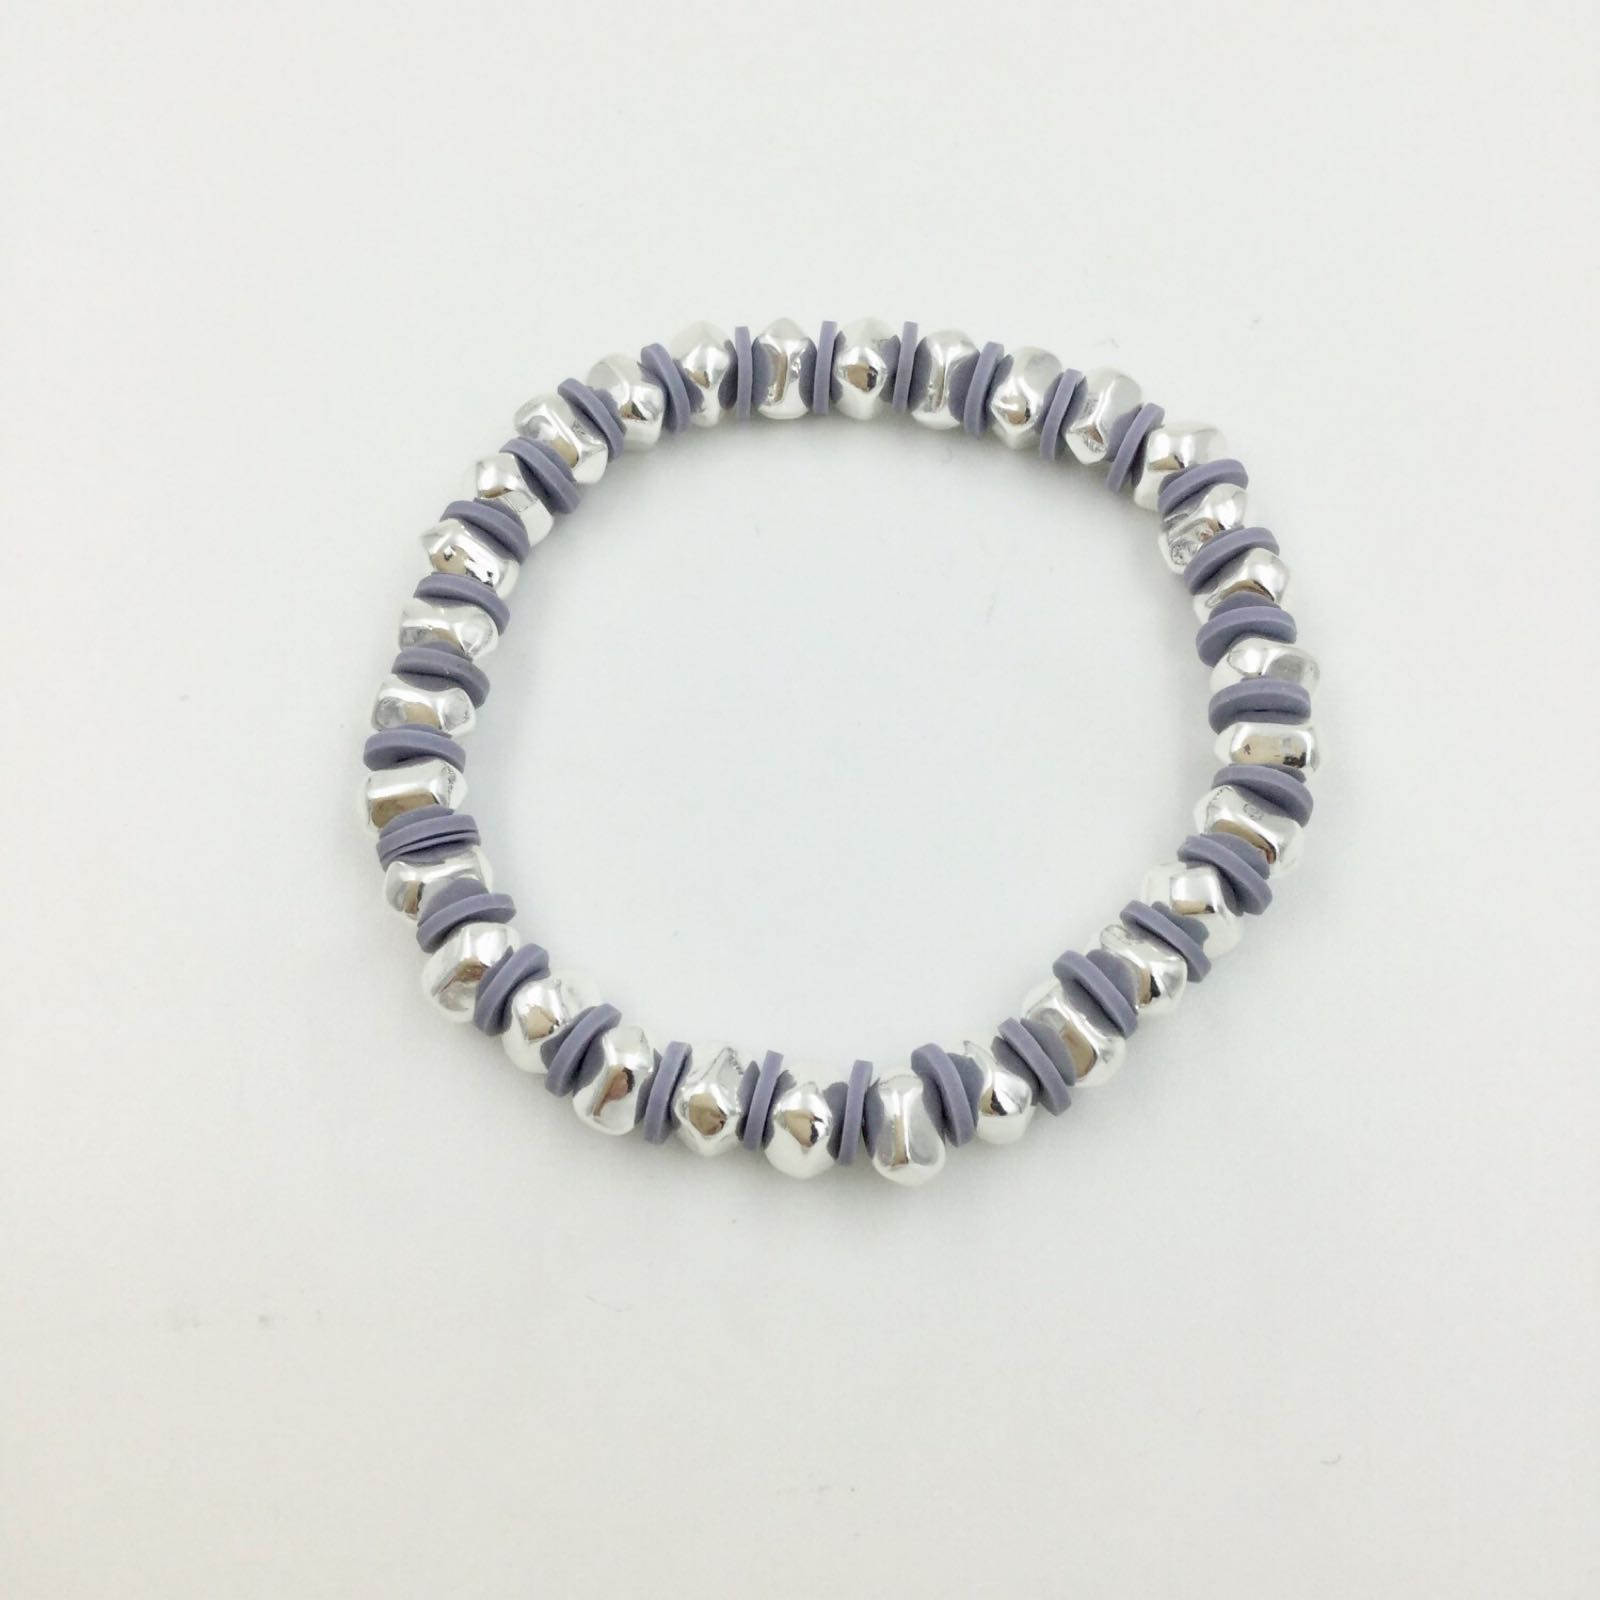 Elasticated Pebble Bracelet - Silver